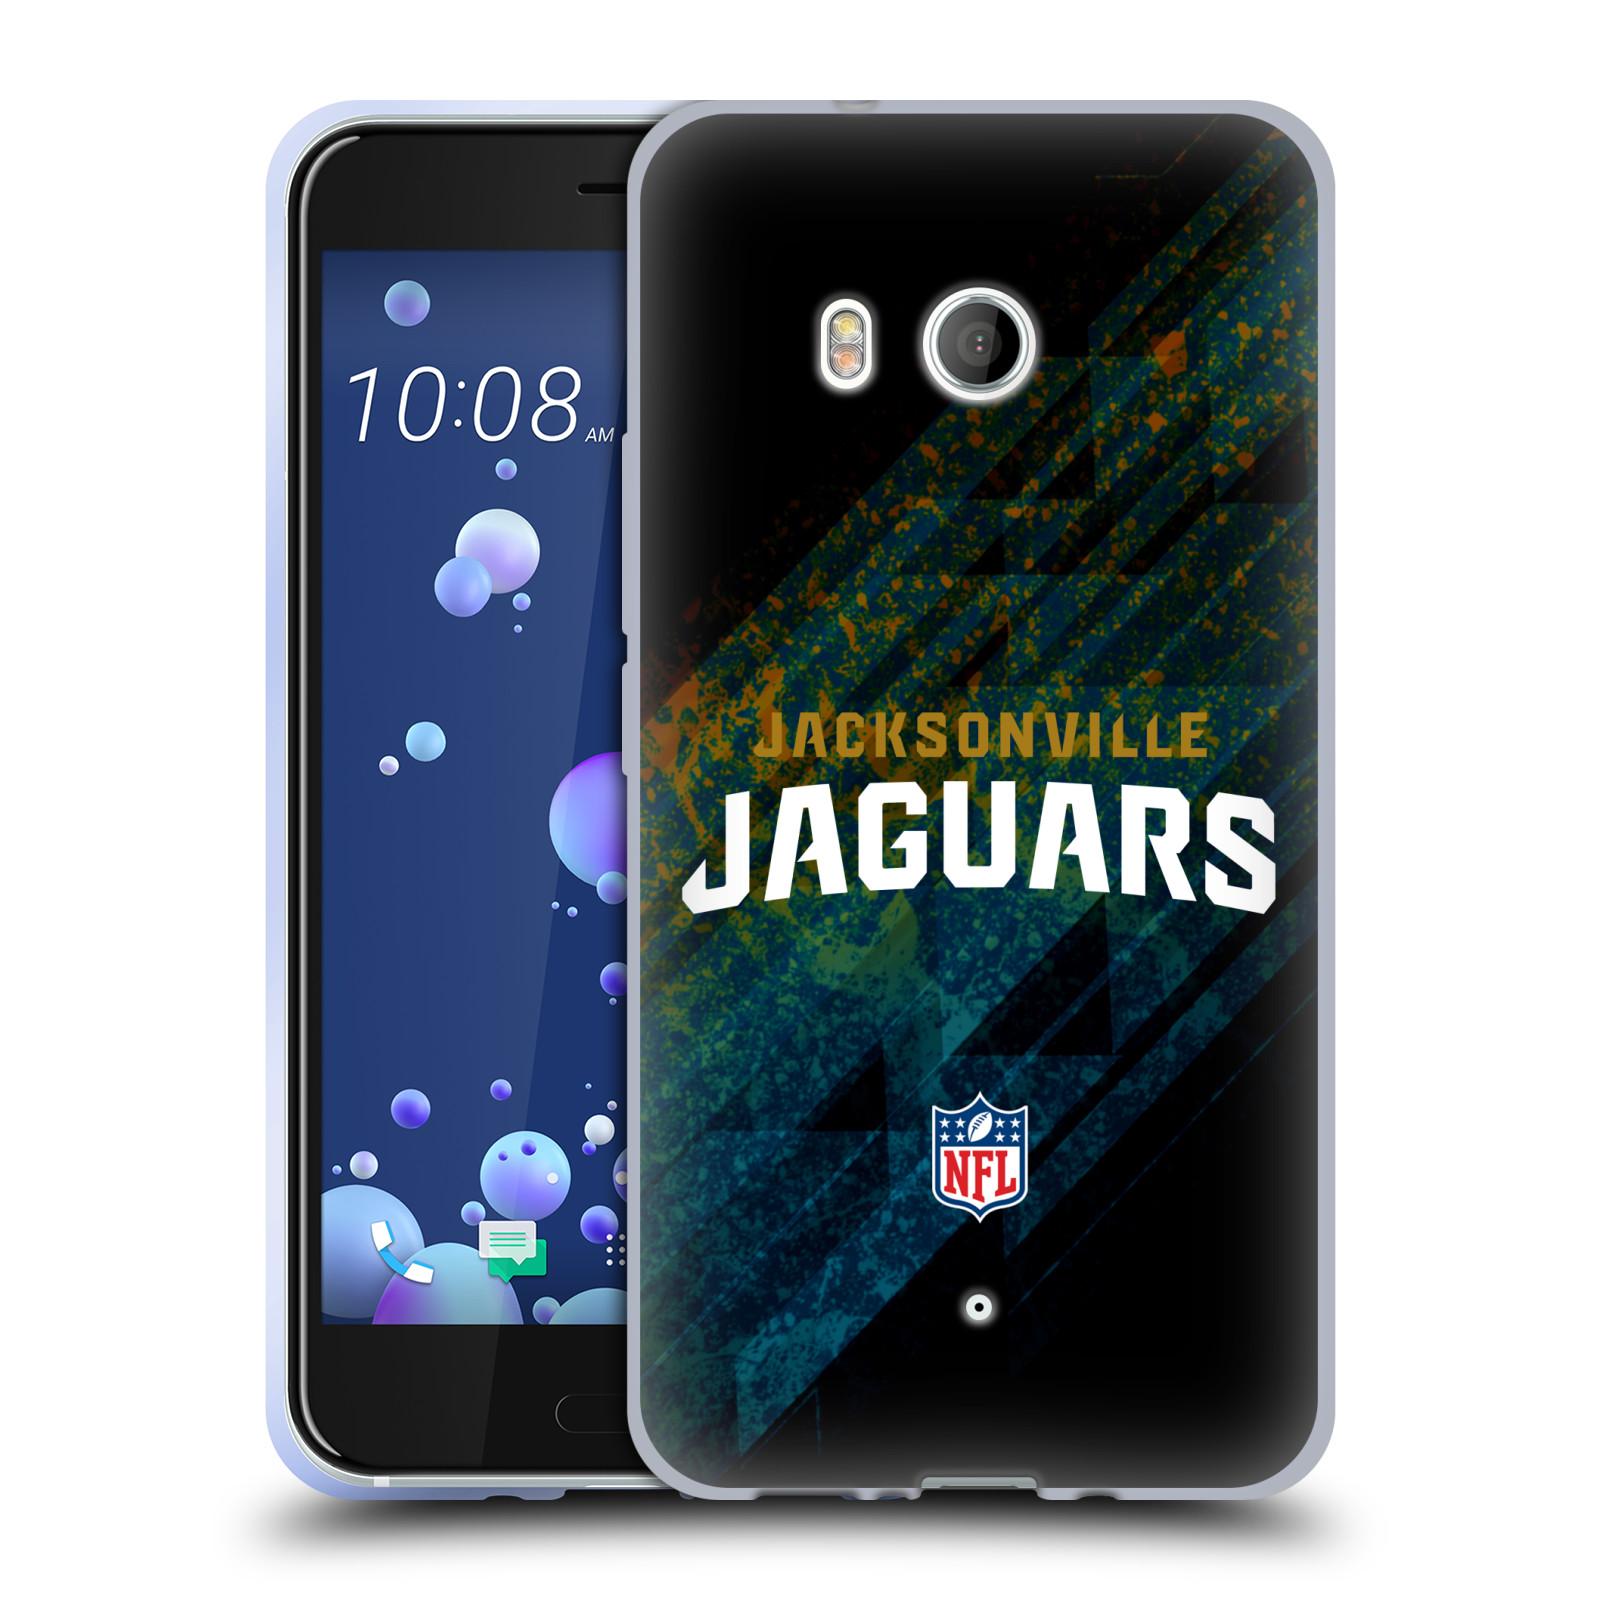 Logotipo-NFL-Jacksonville-Jaguars-oficial-Caso-De-Gel-Suave-para-TELEFONOS-HTC-1